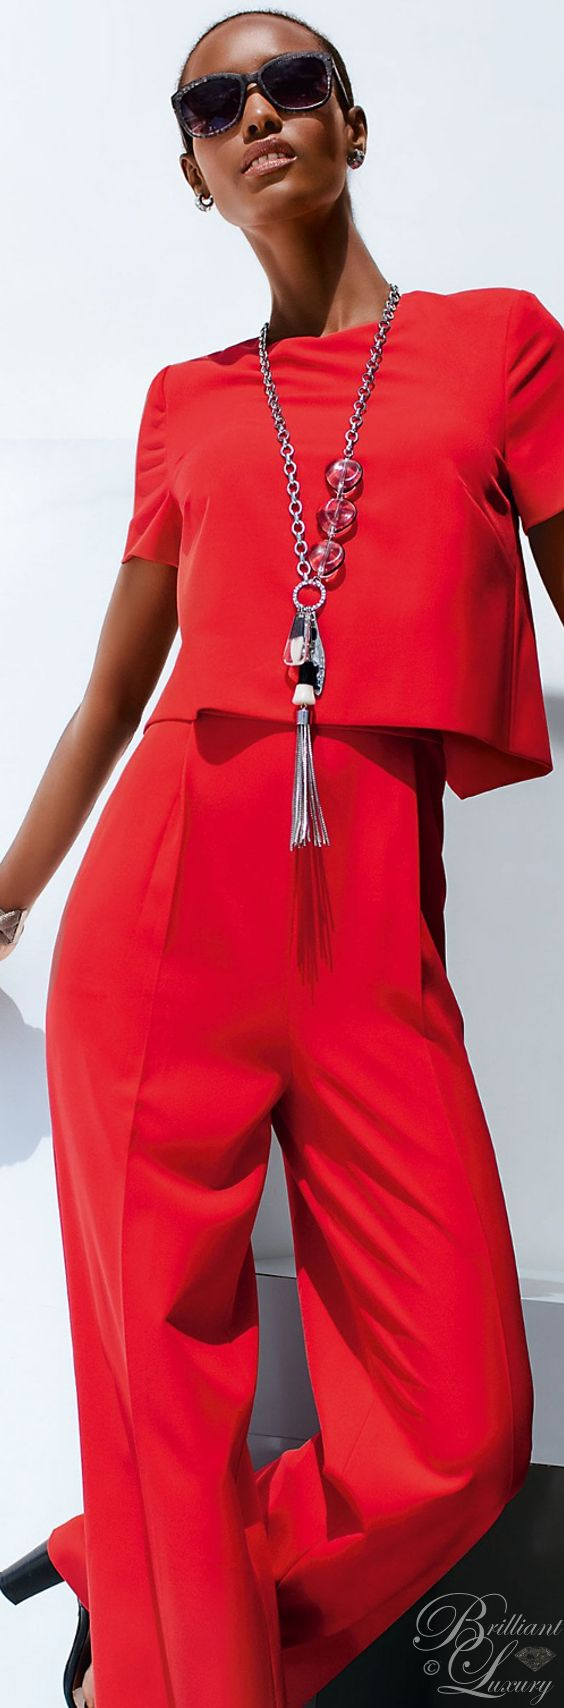 Brilliant Luxury ♦ Madeleine #fashion #red overall